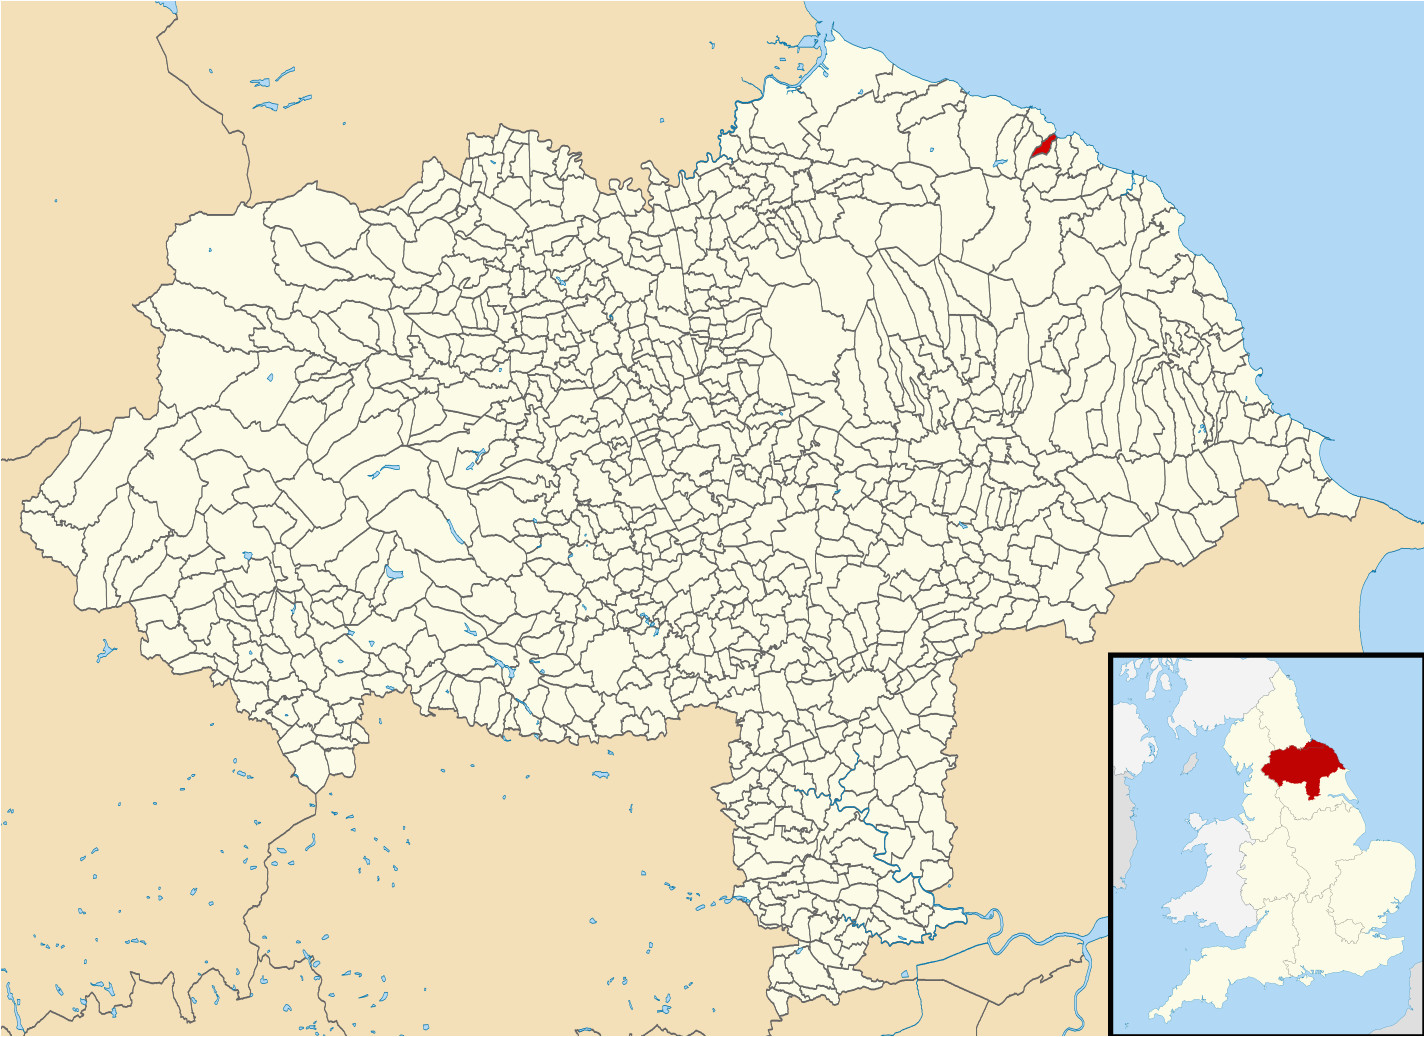 file ellerby north yorkshire uk parish locator map svg wikimedia